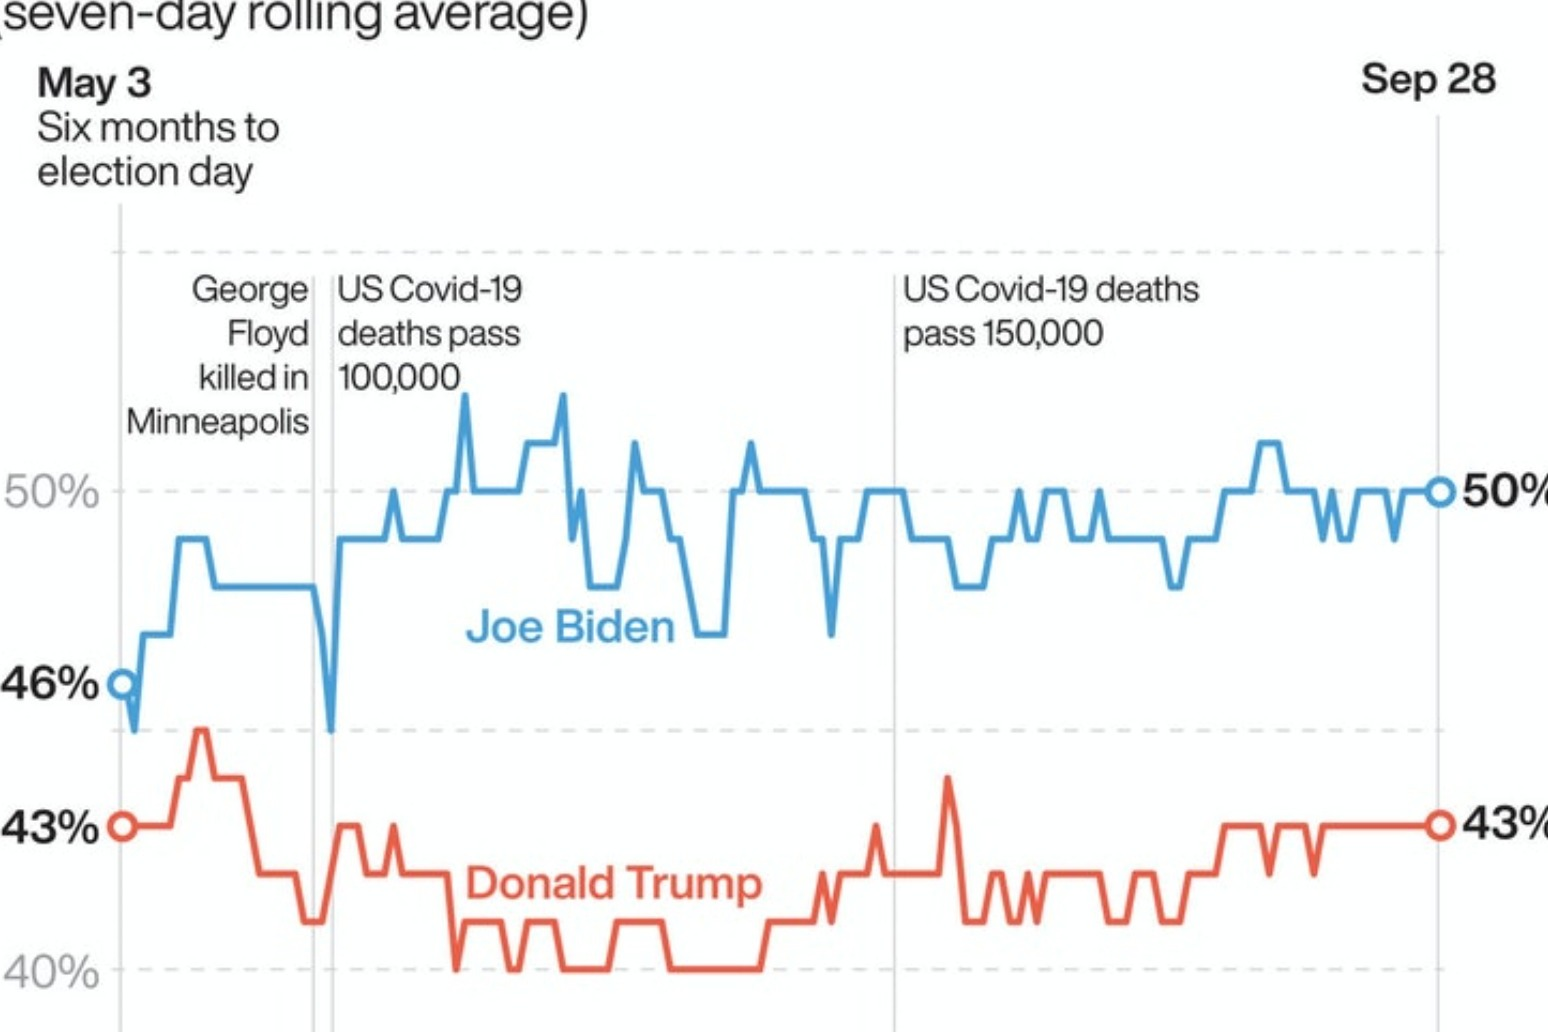 Donald Trump and Joe Biden trade insults in opening election debate